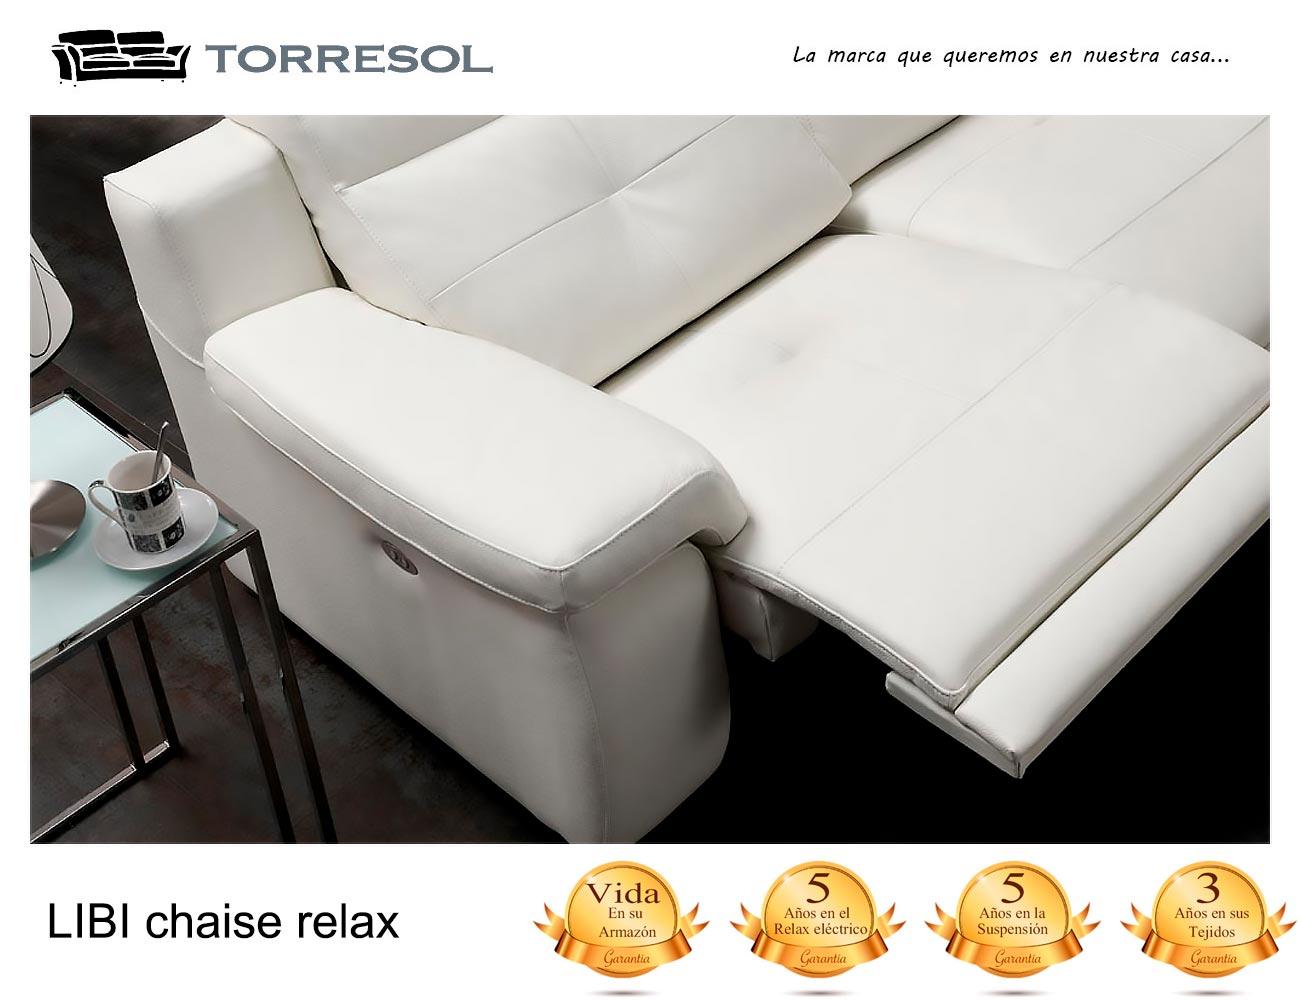 Sofa libi torresol en piel 21